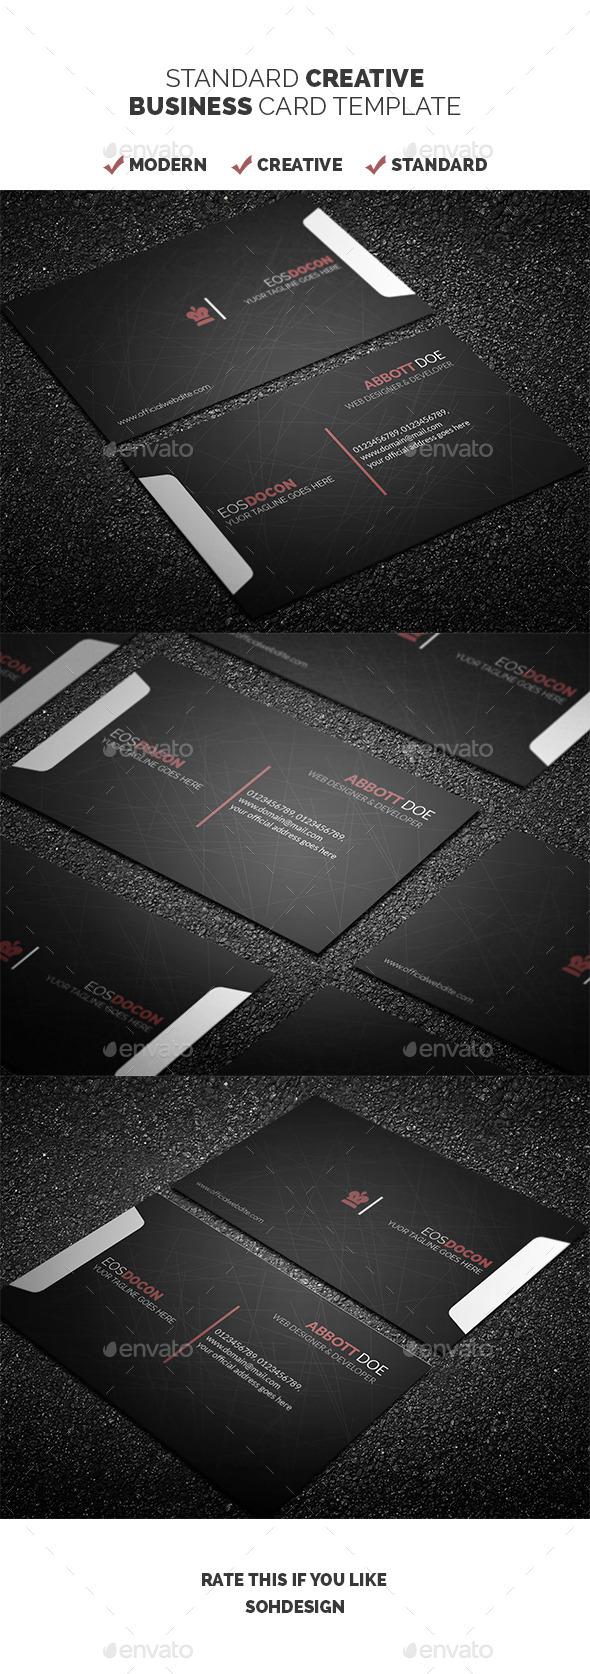 Standard Creative Business Card Template - Creative Business Cards